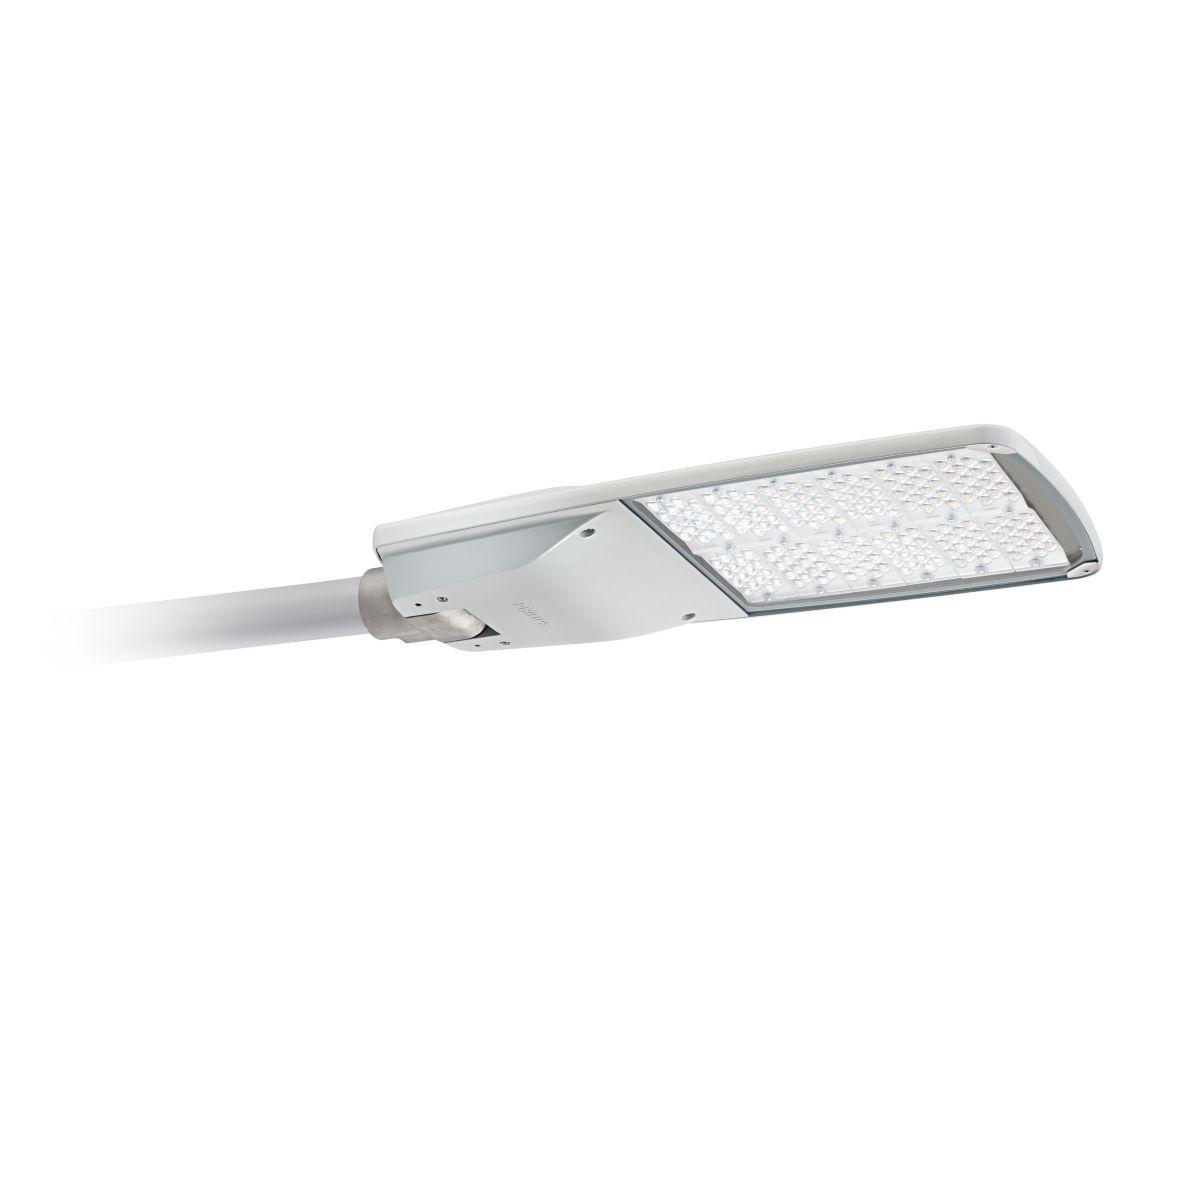 Lumistreet Road And Urban Luminaires Philips Lighting Versatile Emergency Lamp